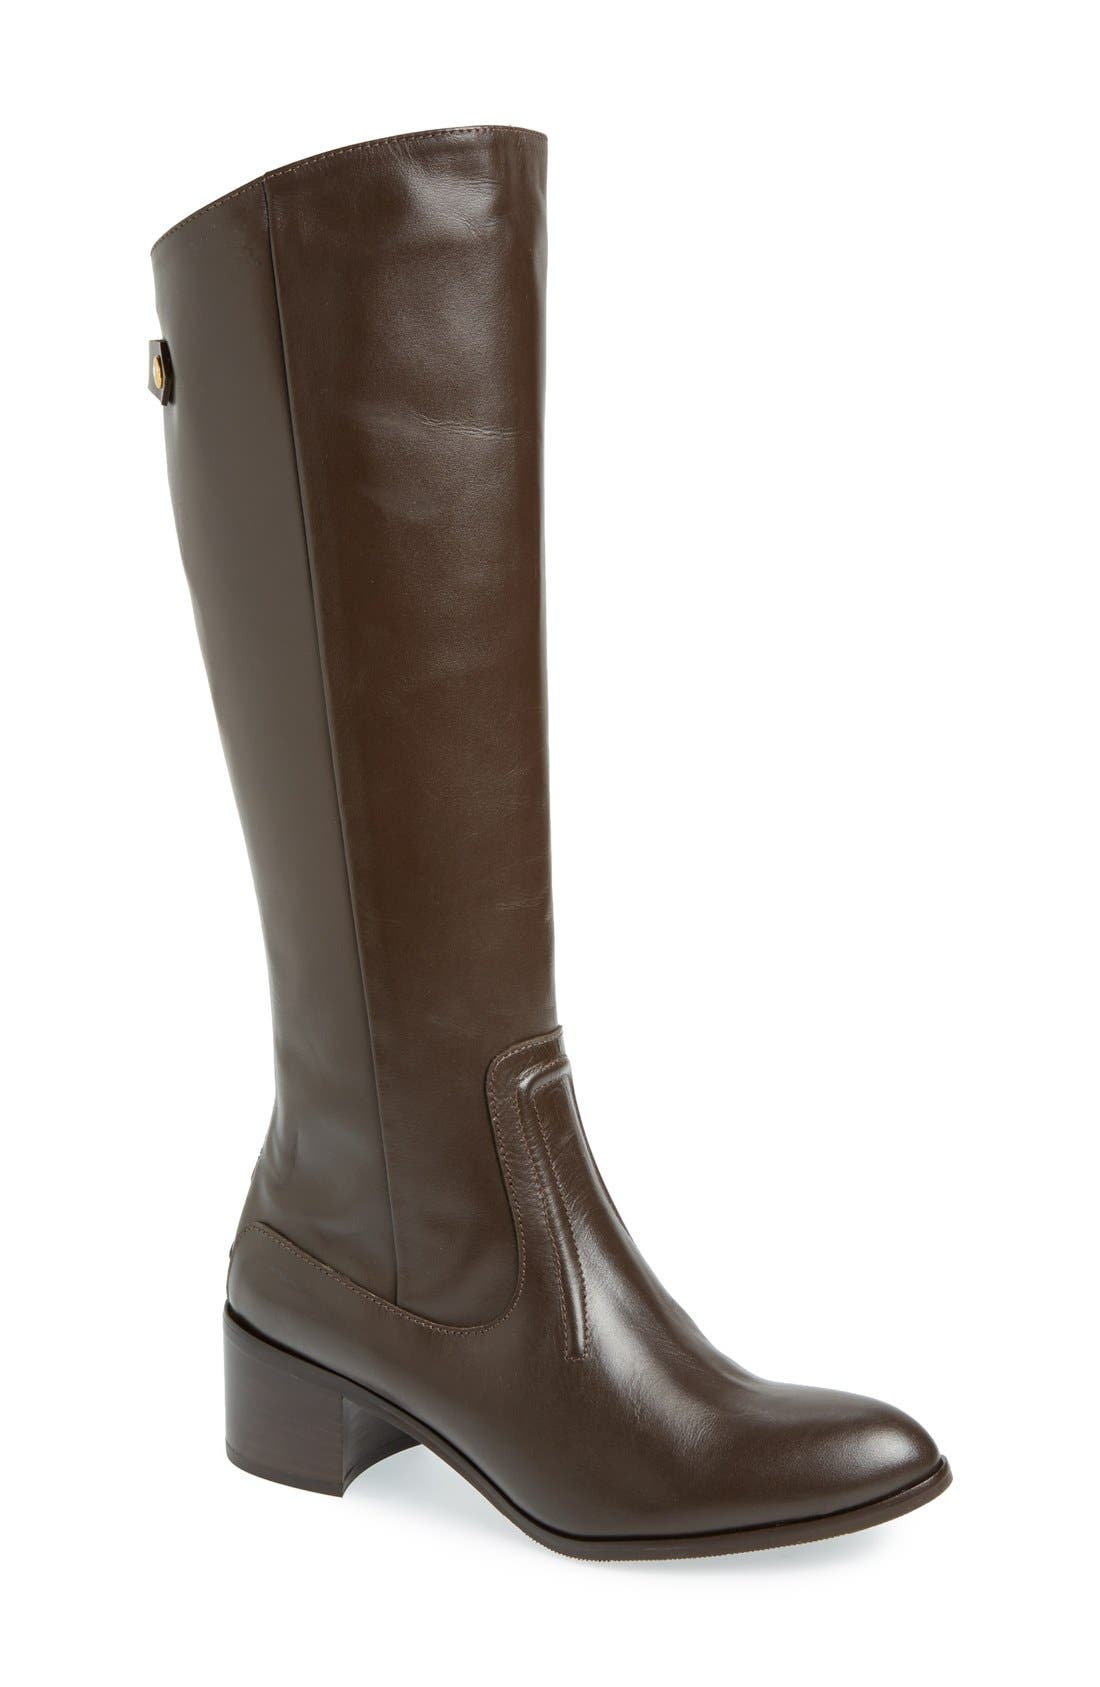 Alternate Image 1 Selected - Charles David 'Ramu' Leather Riding Boot (Women)